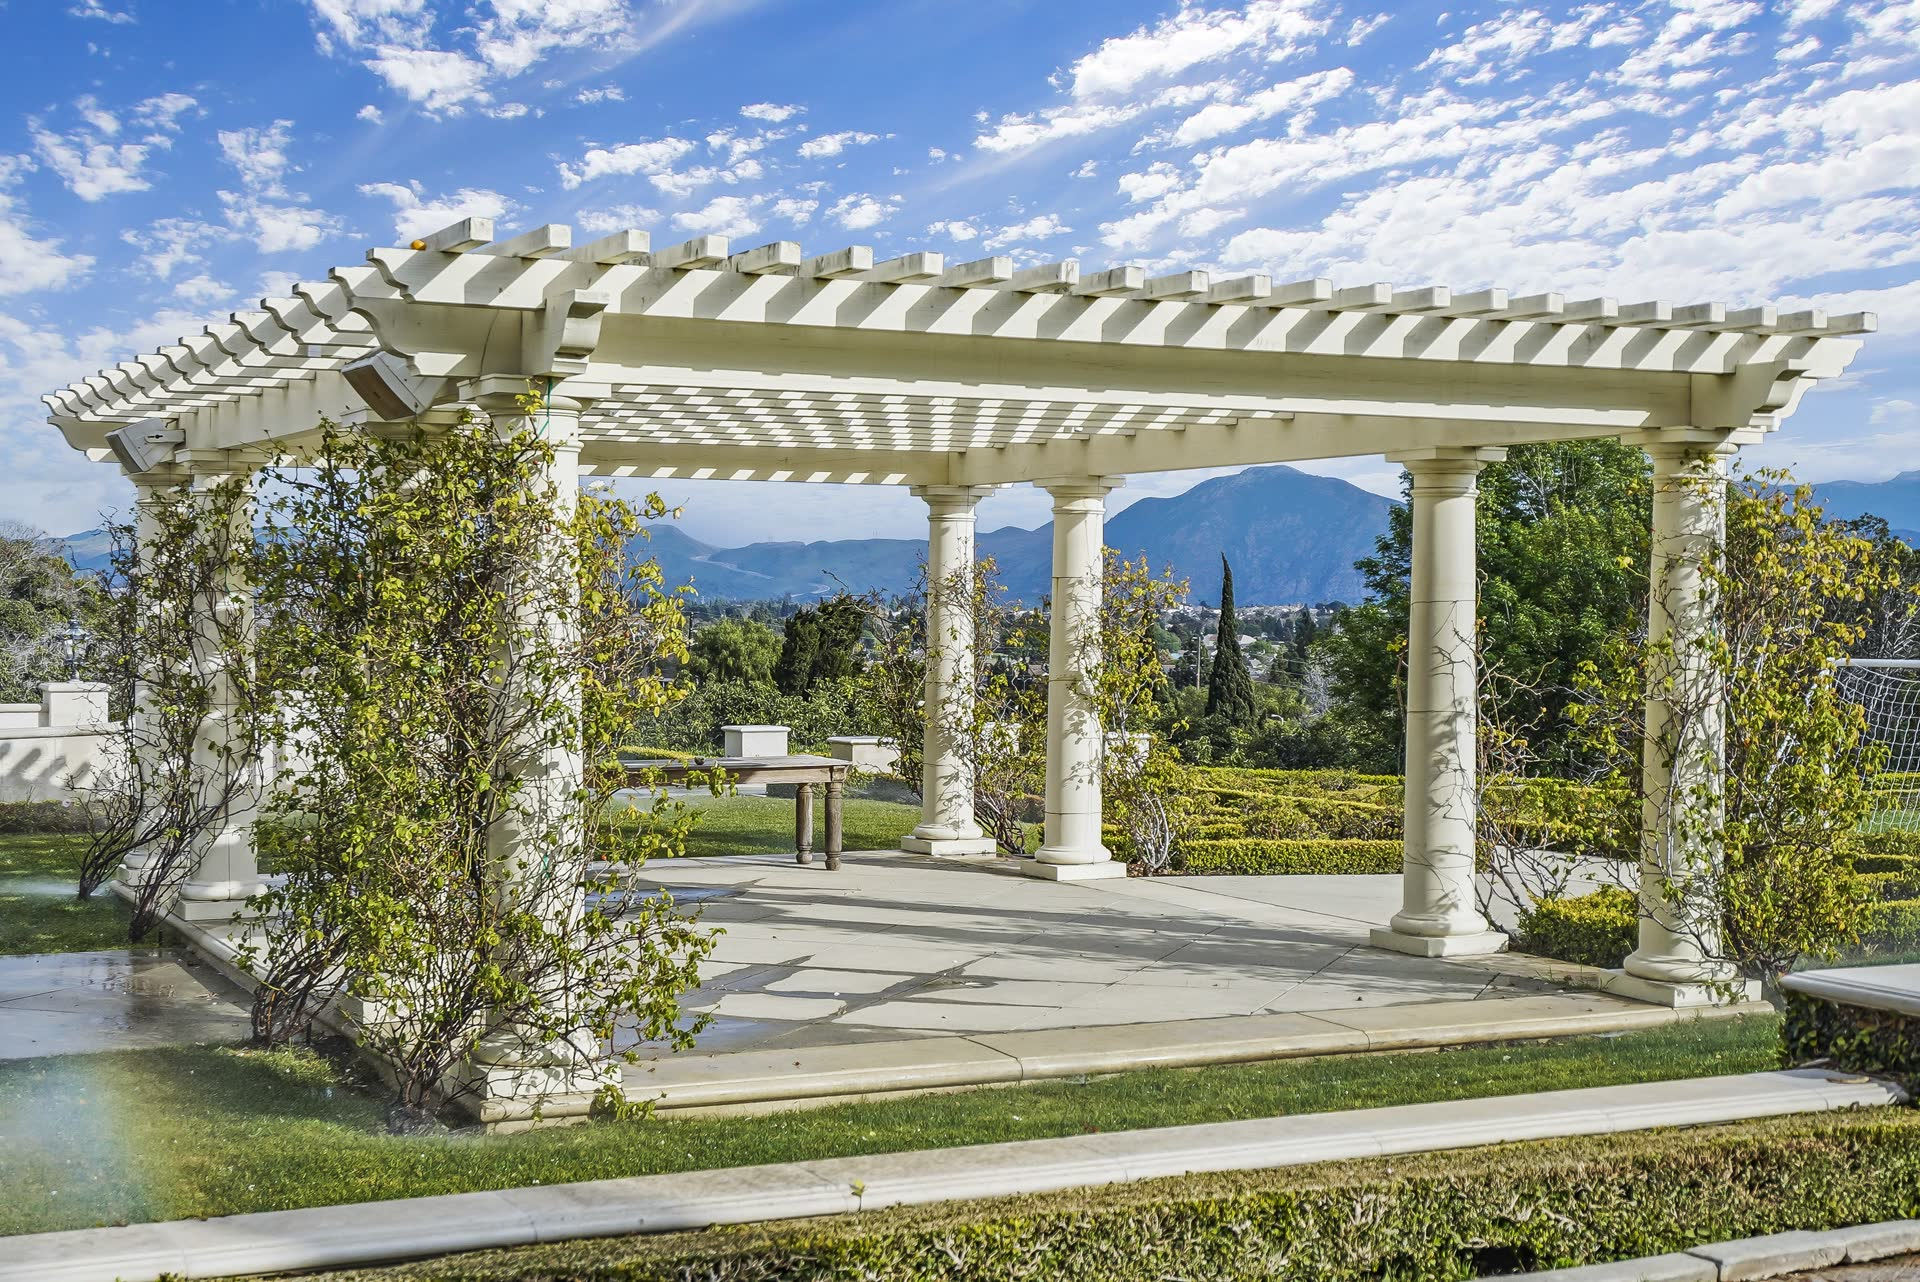 Memorial spaces